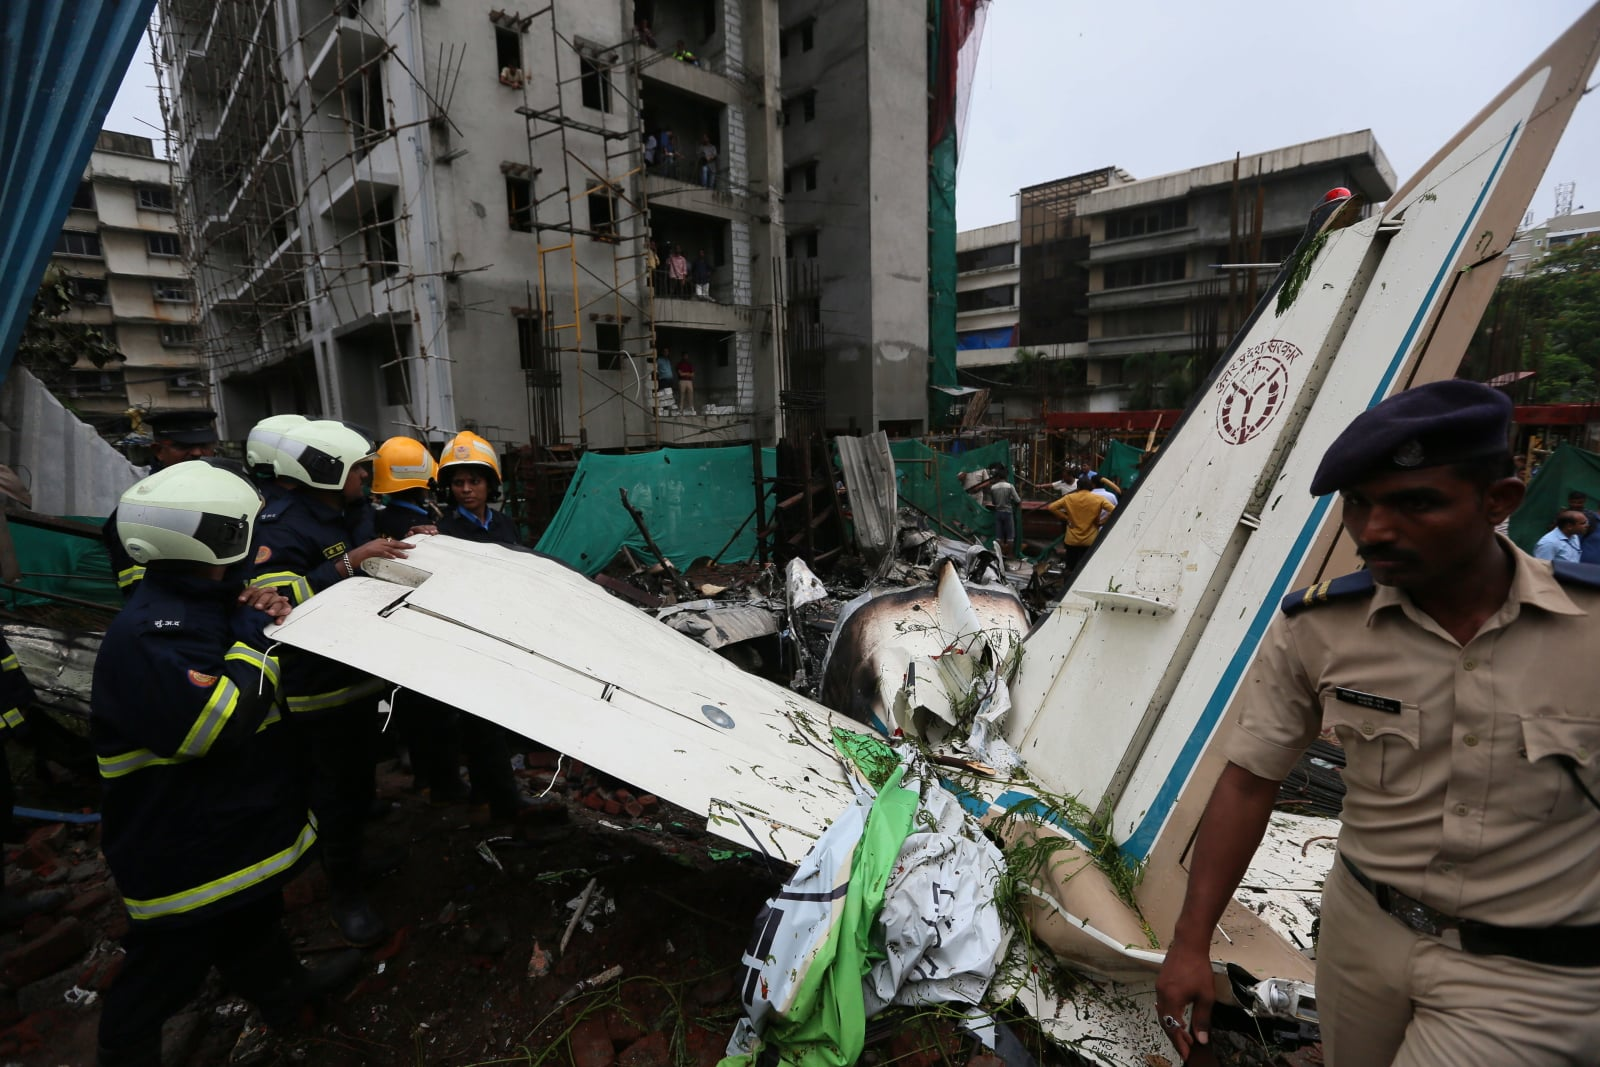 Katastrofa samolotu w Indiach  EPA/DIVYAKANT SOLANKI